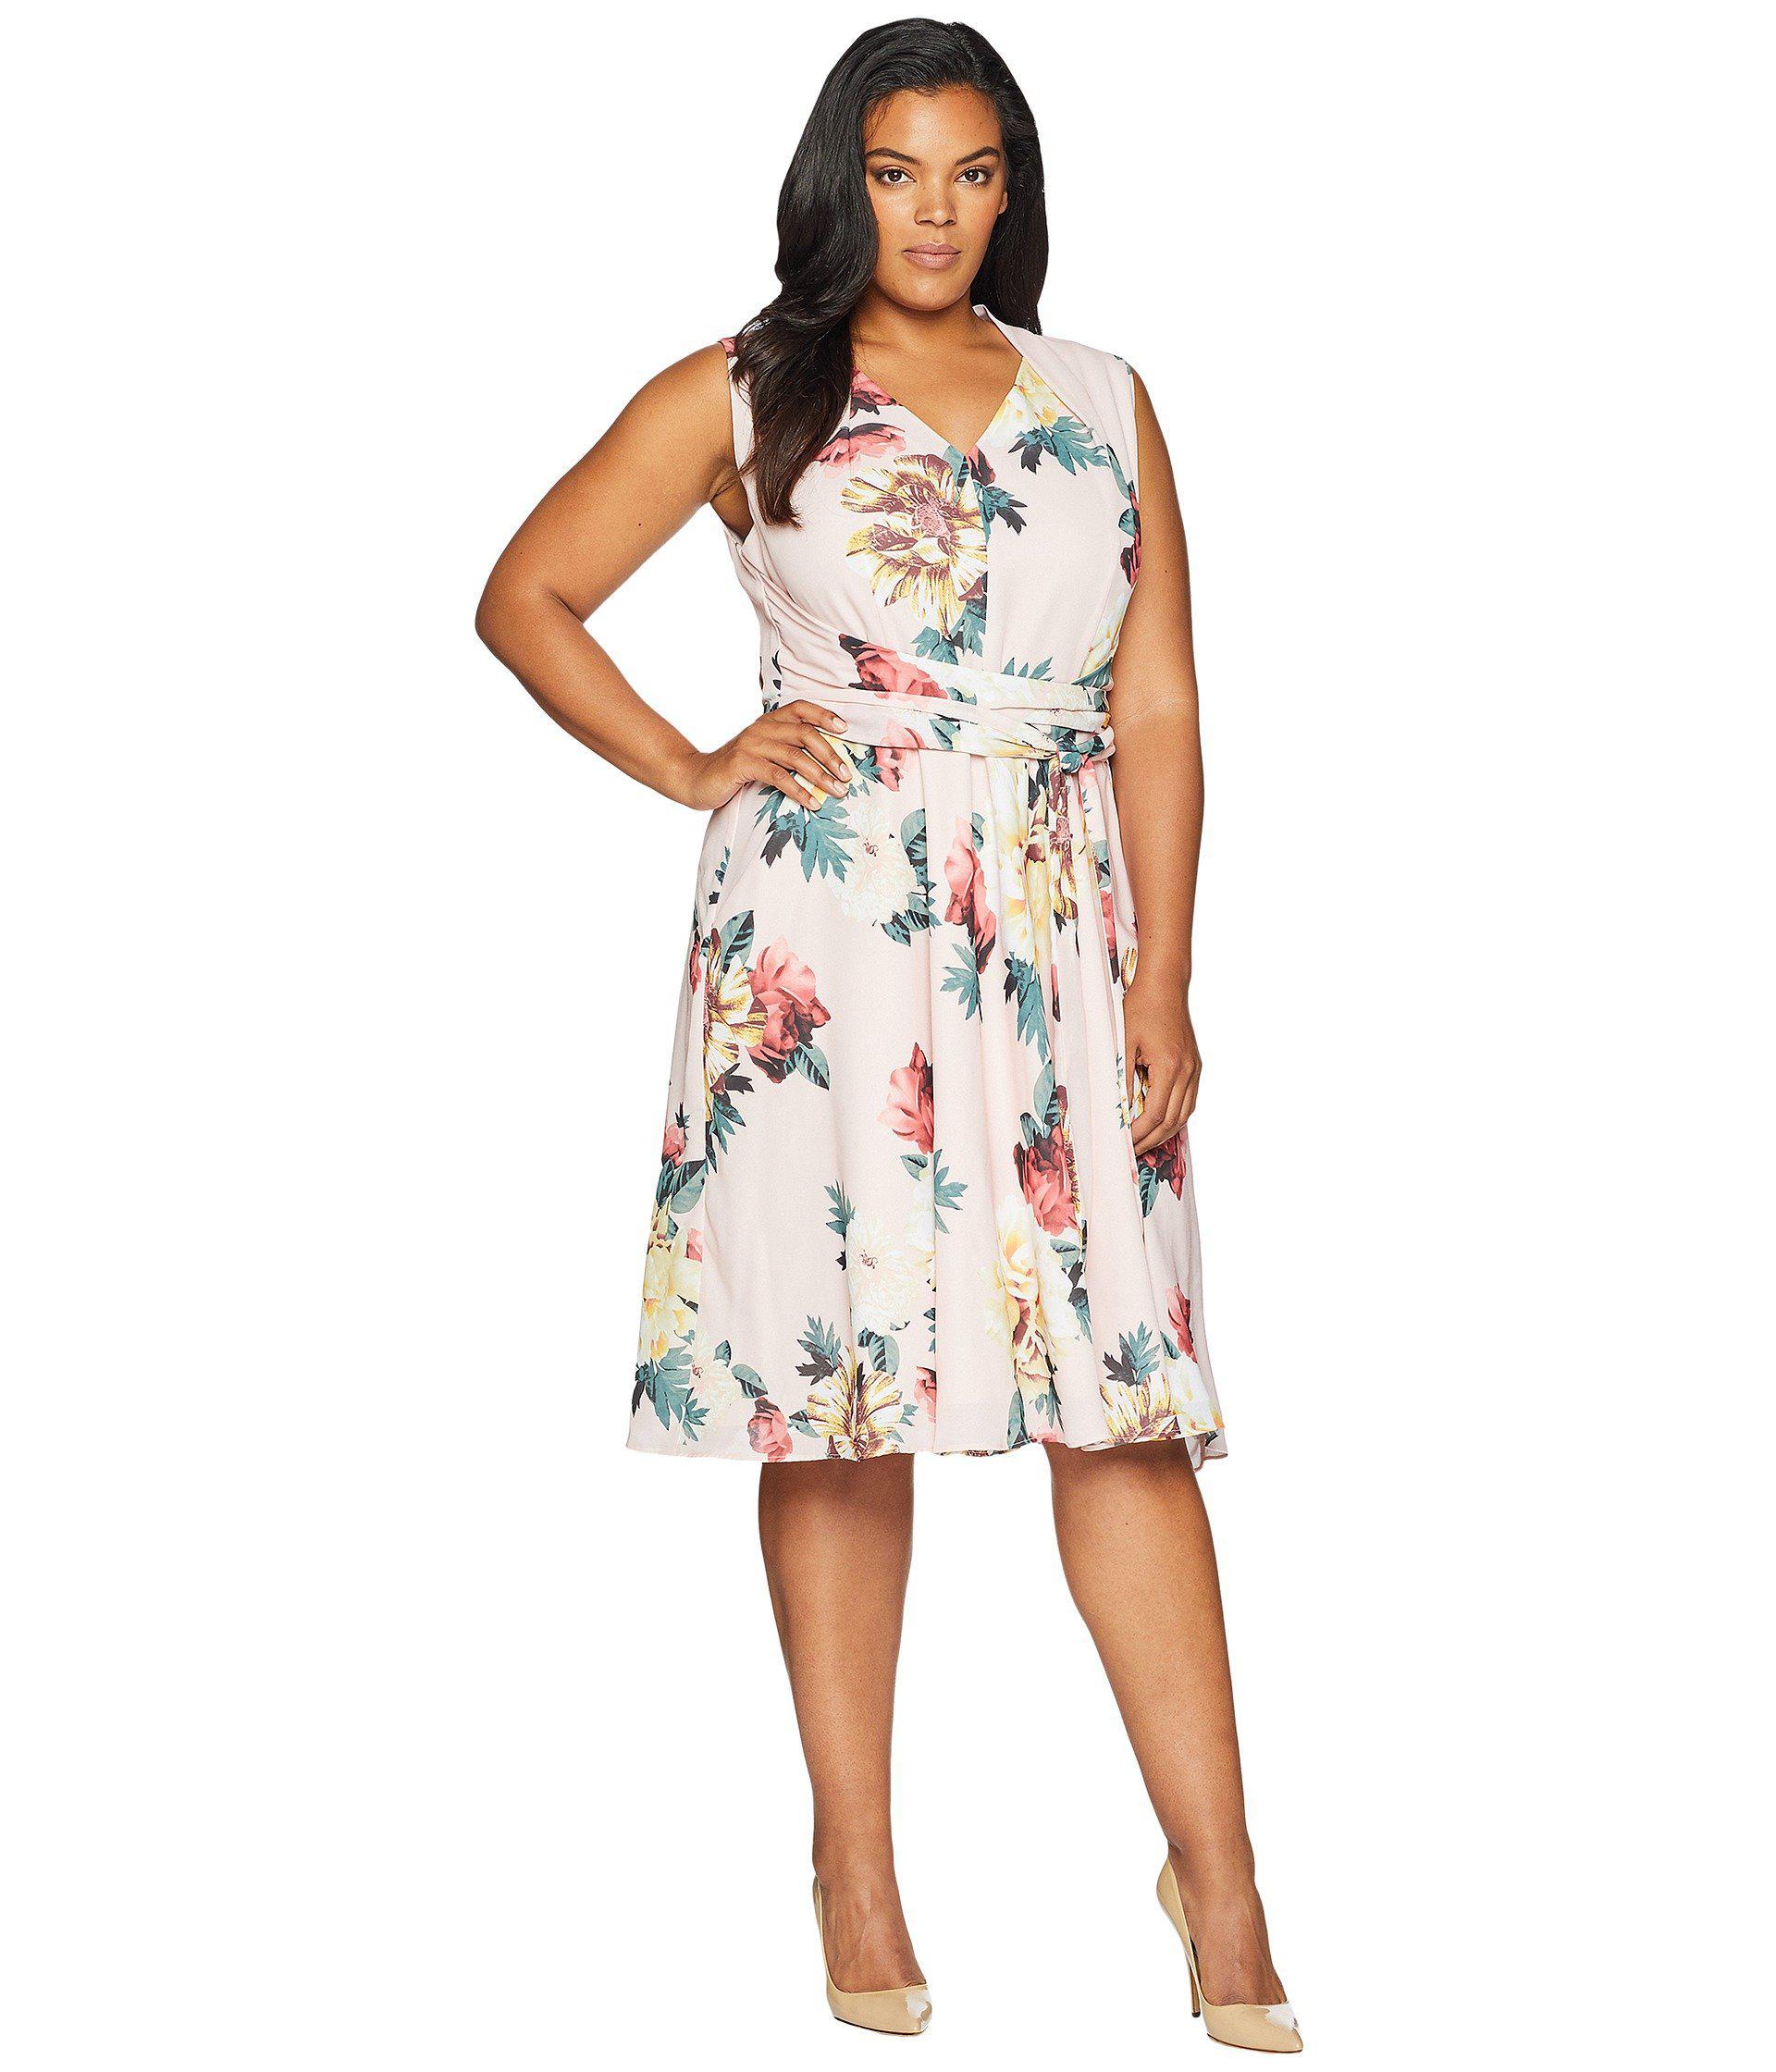 de47e62534f7 Lyst - Tahari Plus Size Georgette Wrap Waist Dress - Save 15%